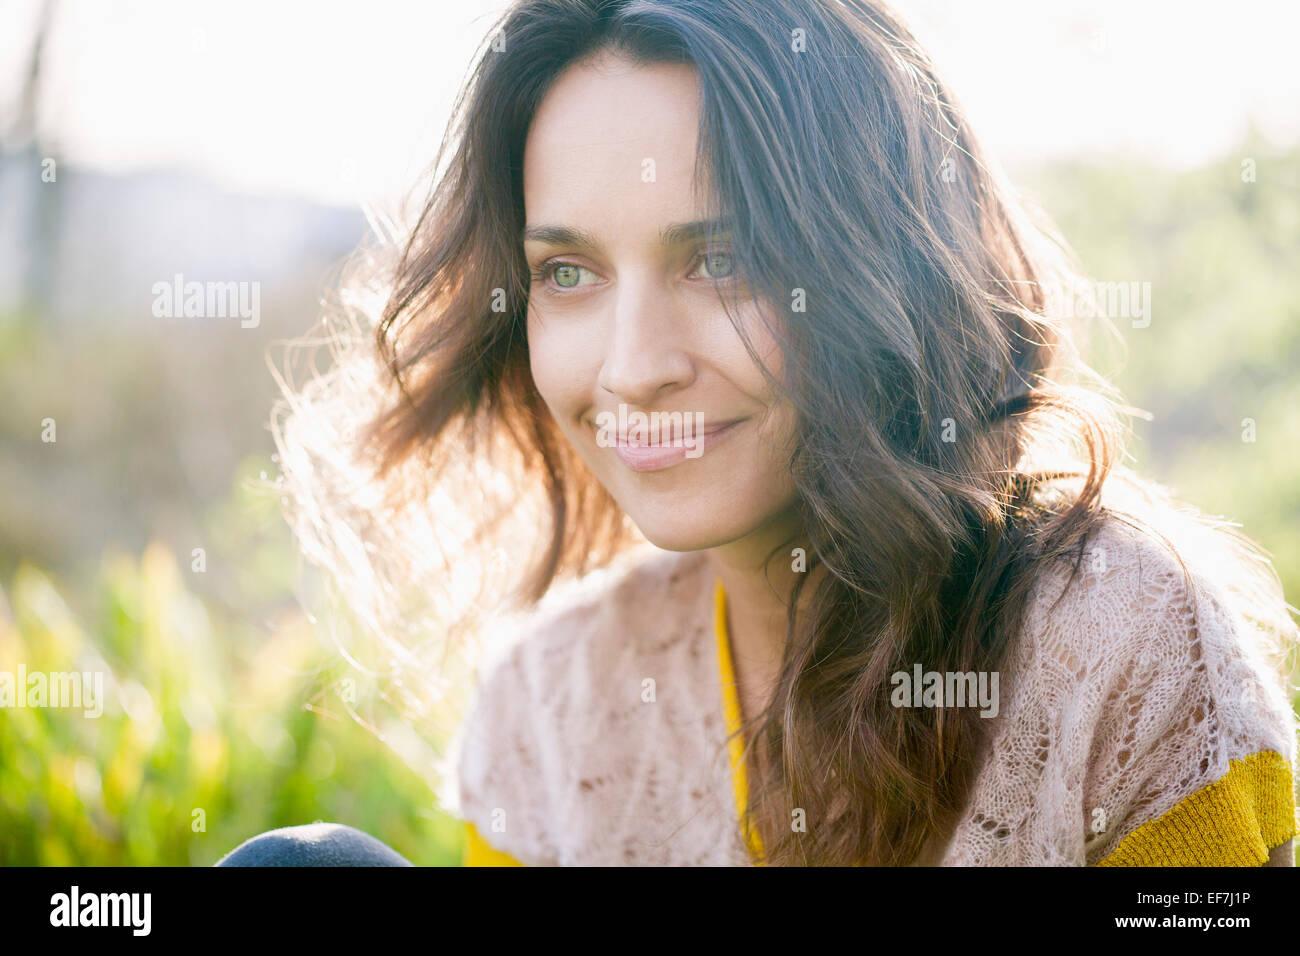 Beautiful woman smiling Photo Stock